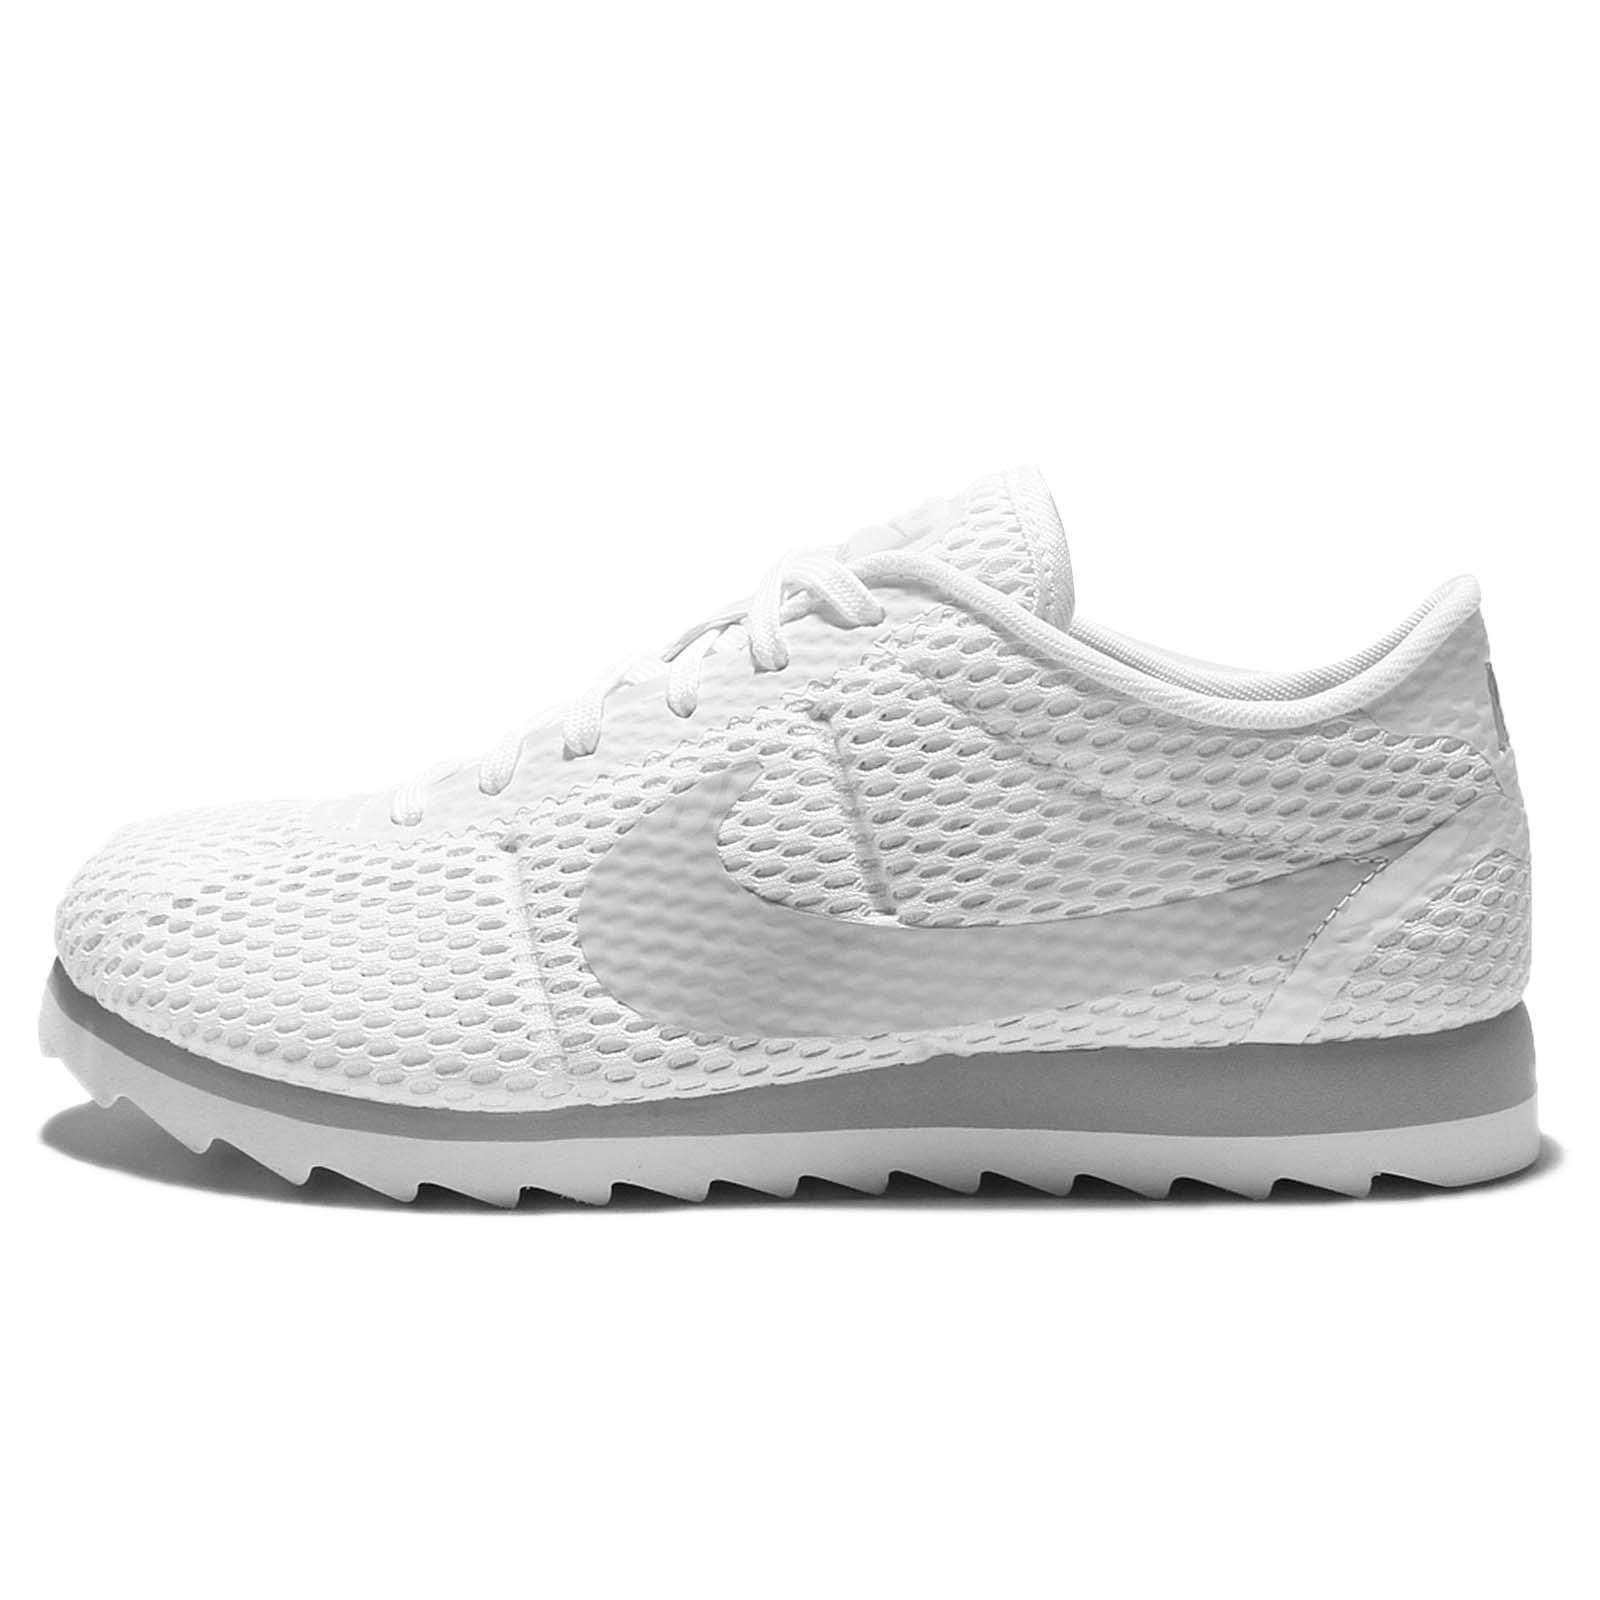 6db9b504cc2 Womens Nike Cortez Ultra Finish Line